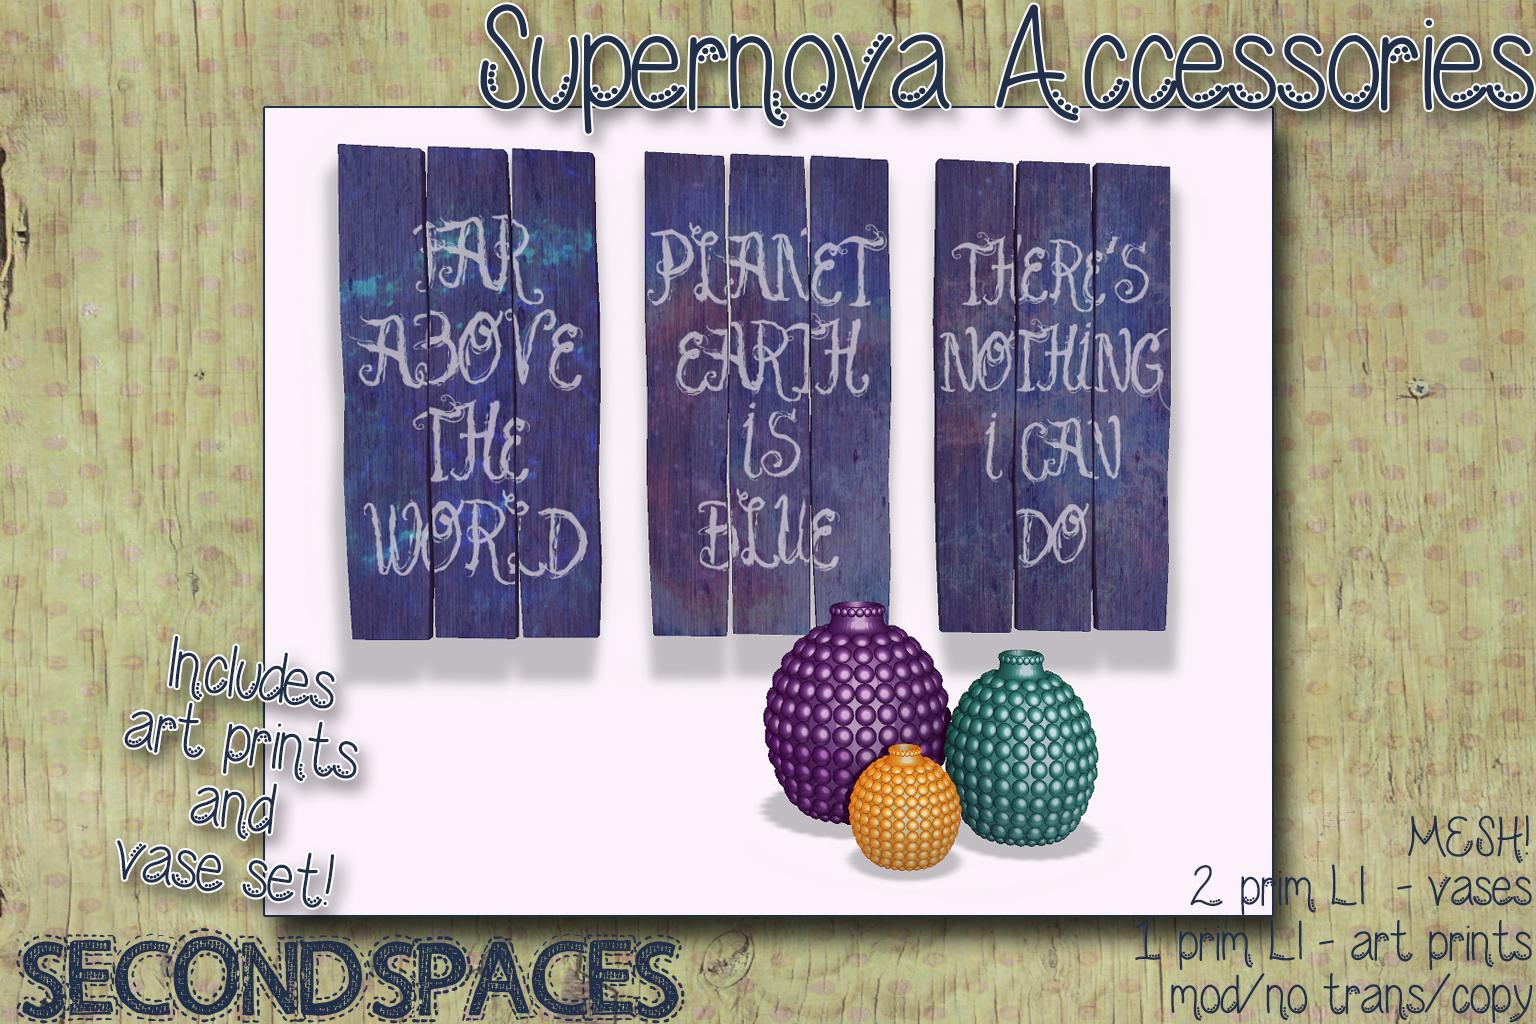 supernova accessories_vendor.jpg